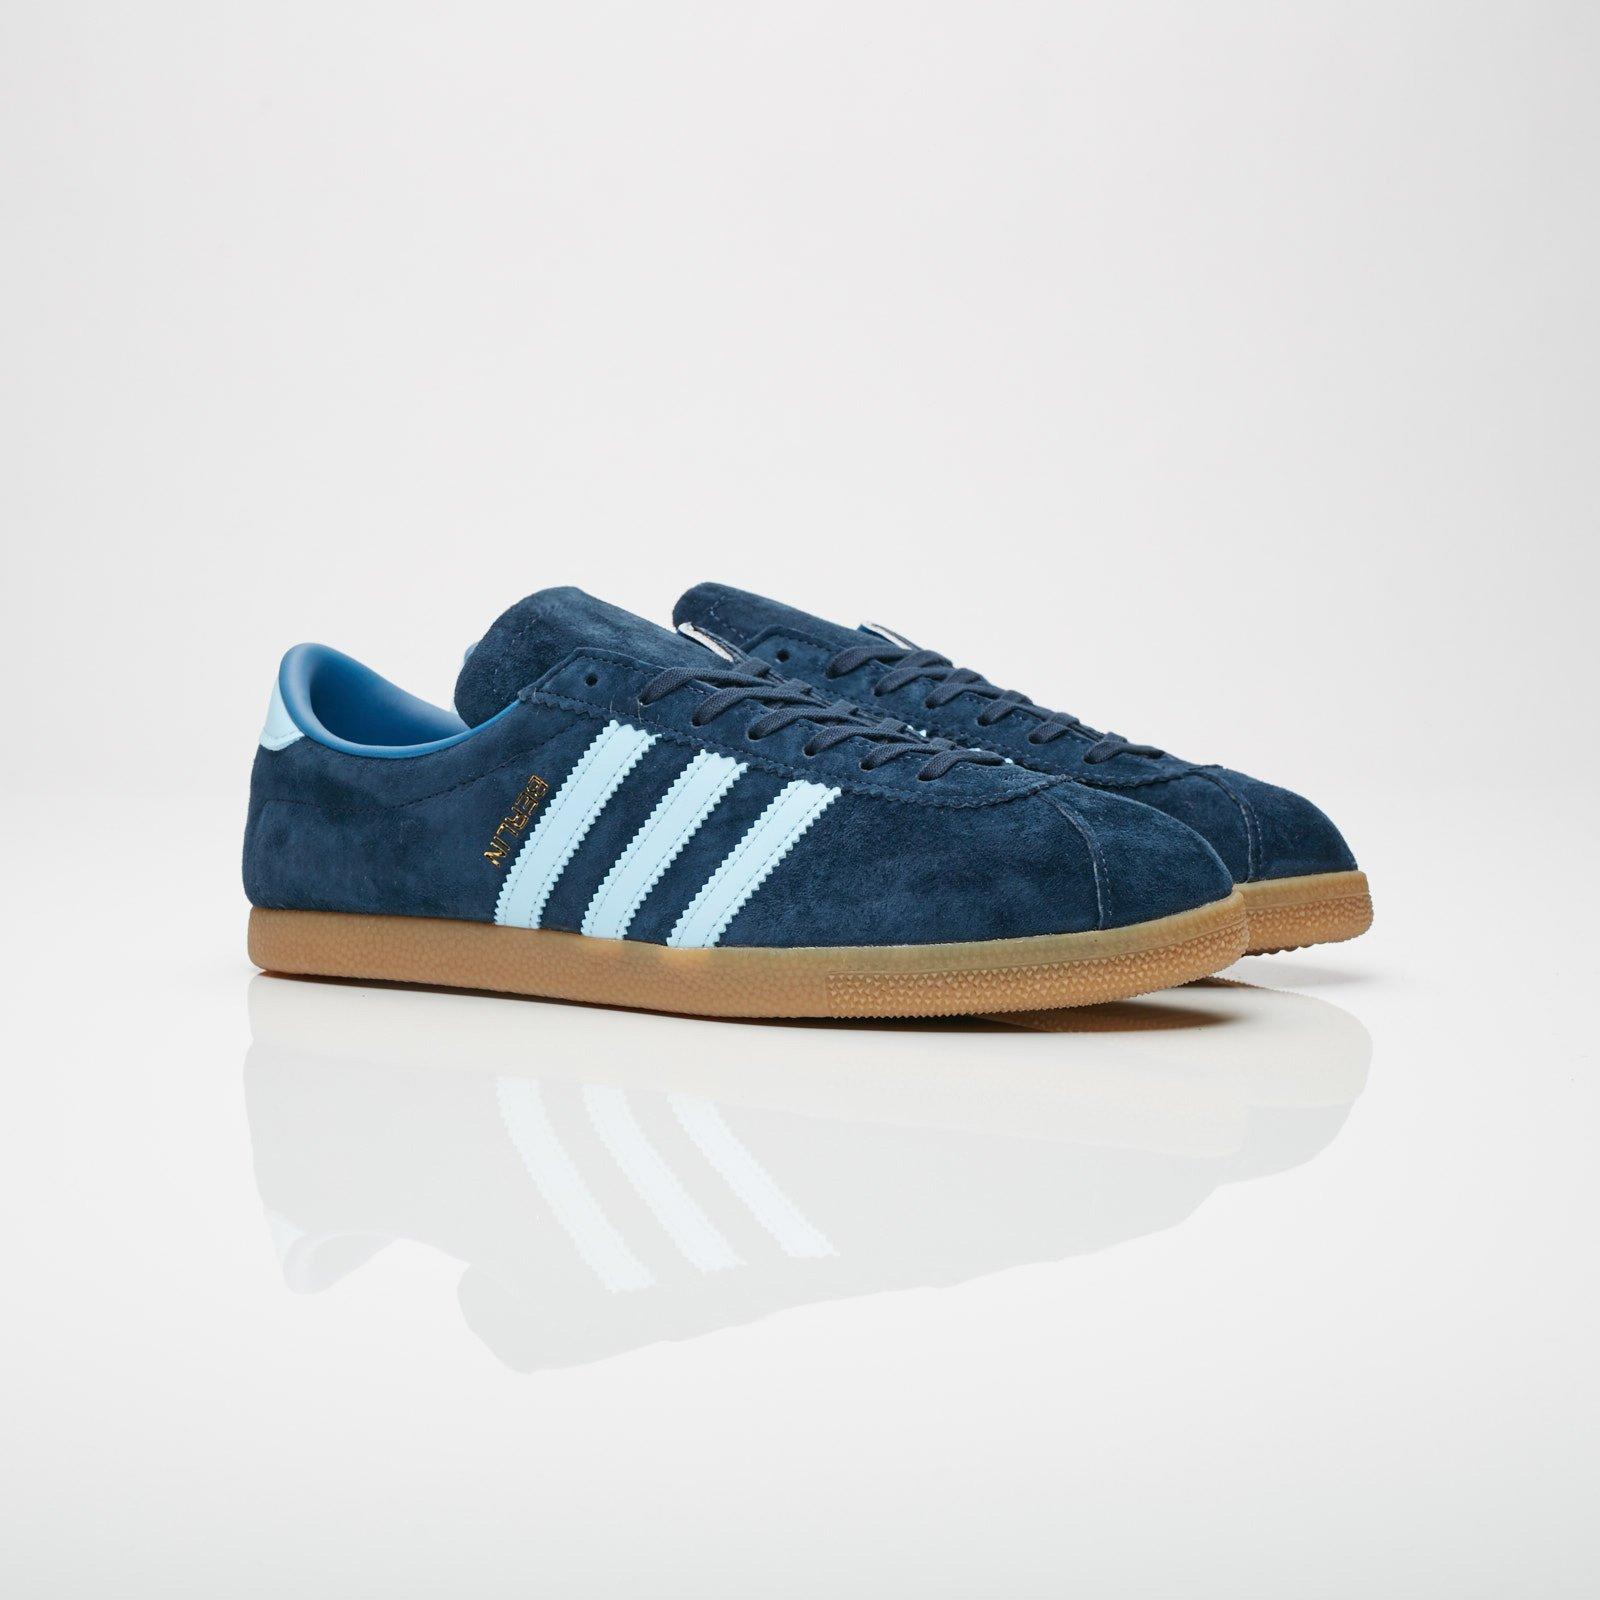 adidas Berlin - Cq2754 - Sneakersnstuff | sneakers & streetwear ...